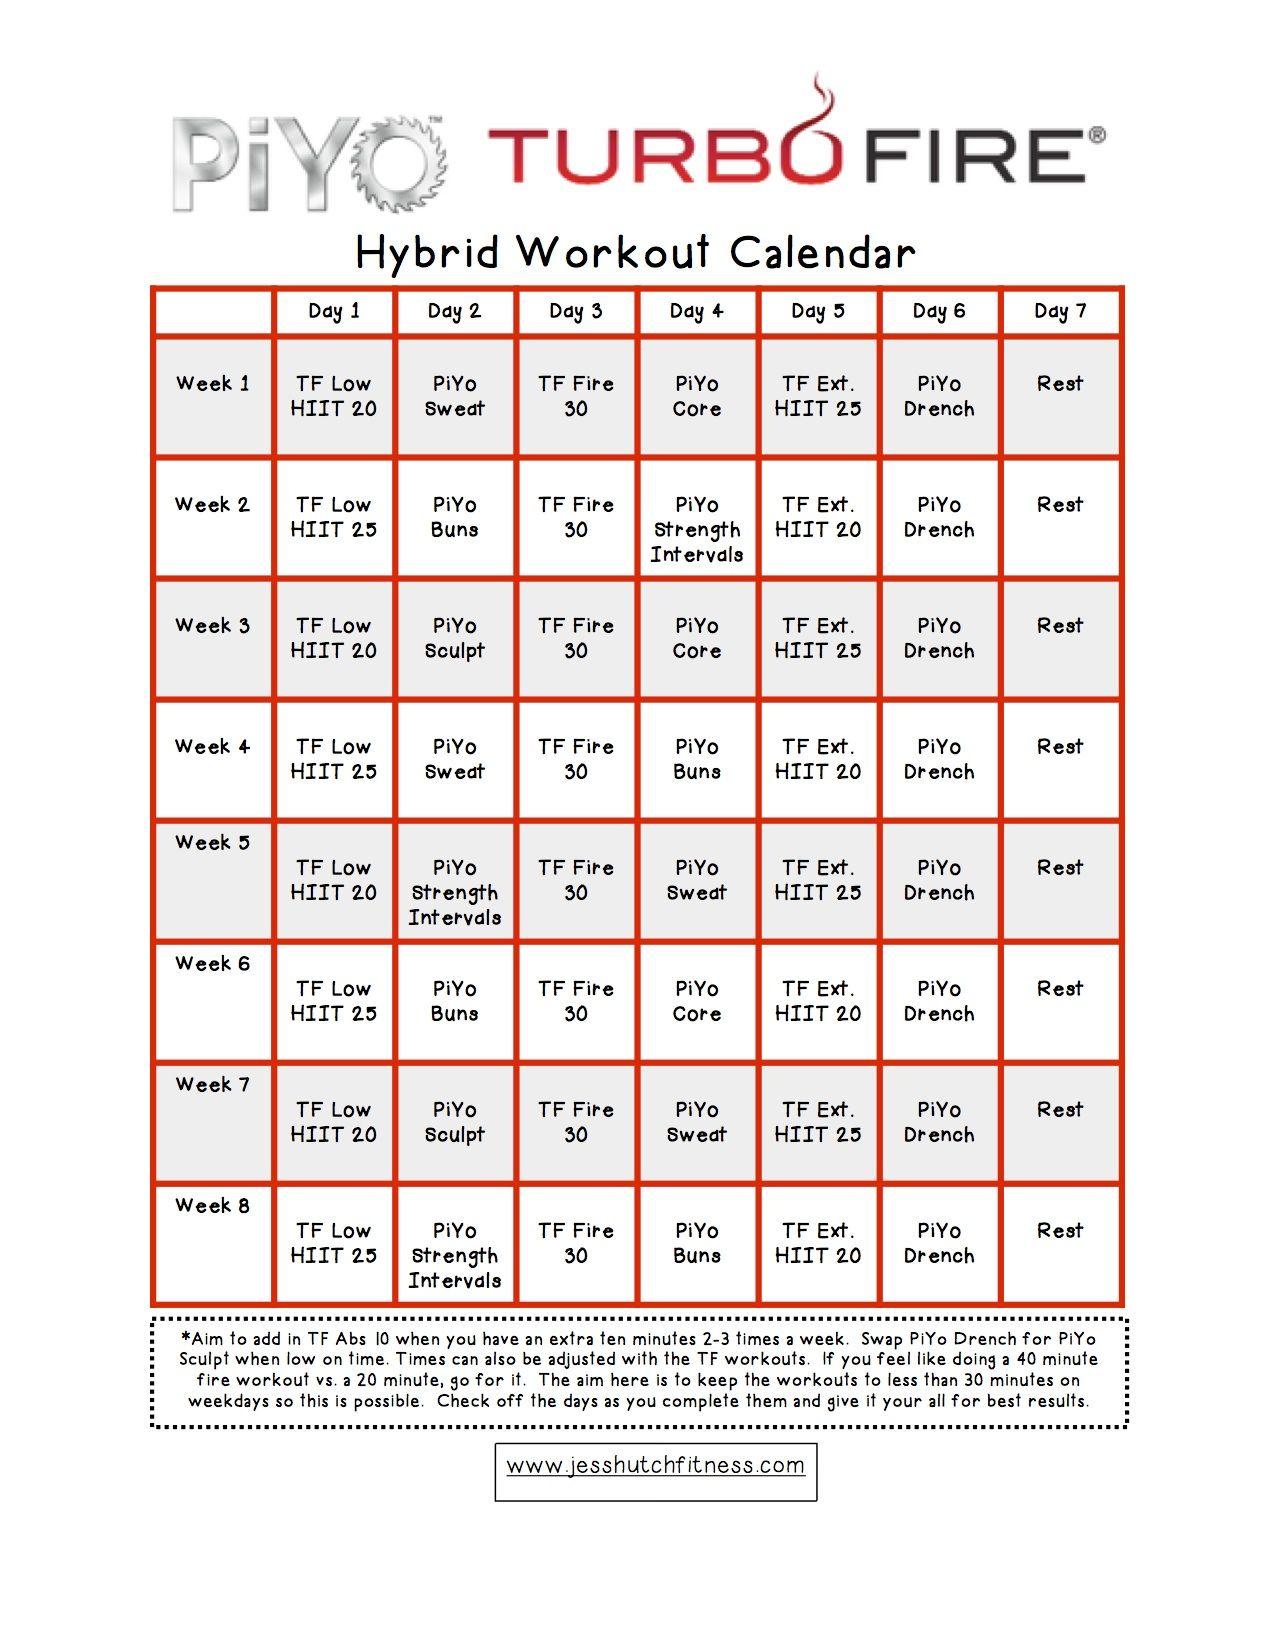 piyo/turbofire hybrid calendar | craig's fitness | fitness, workout